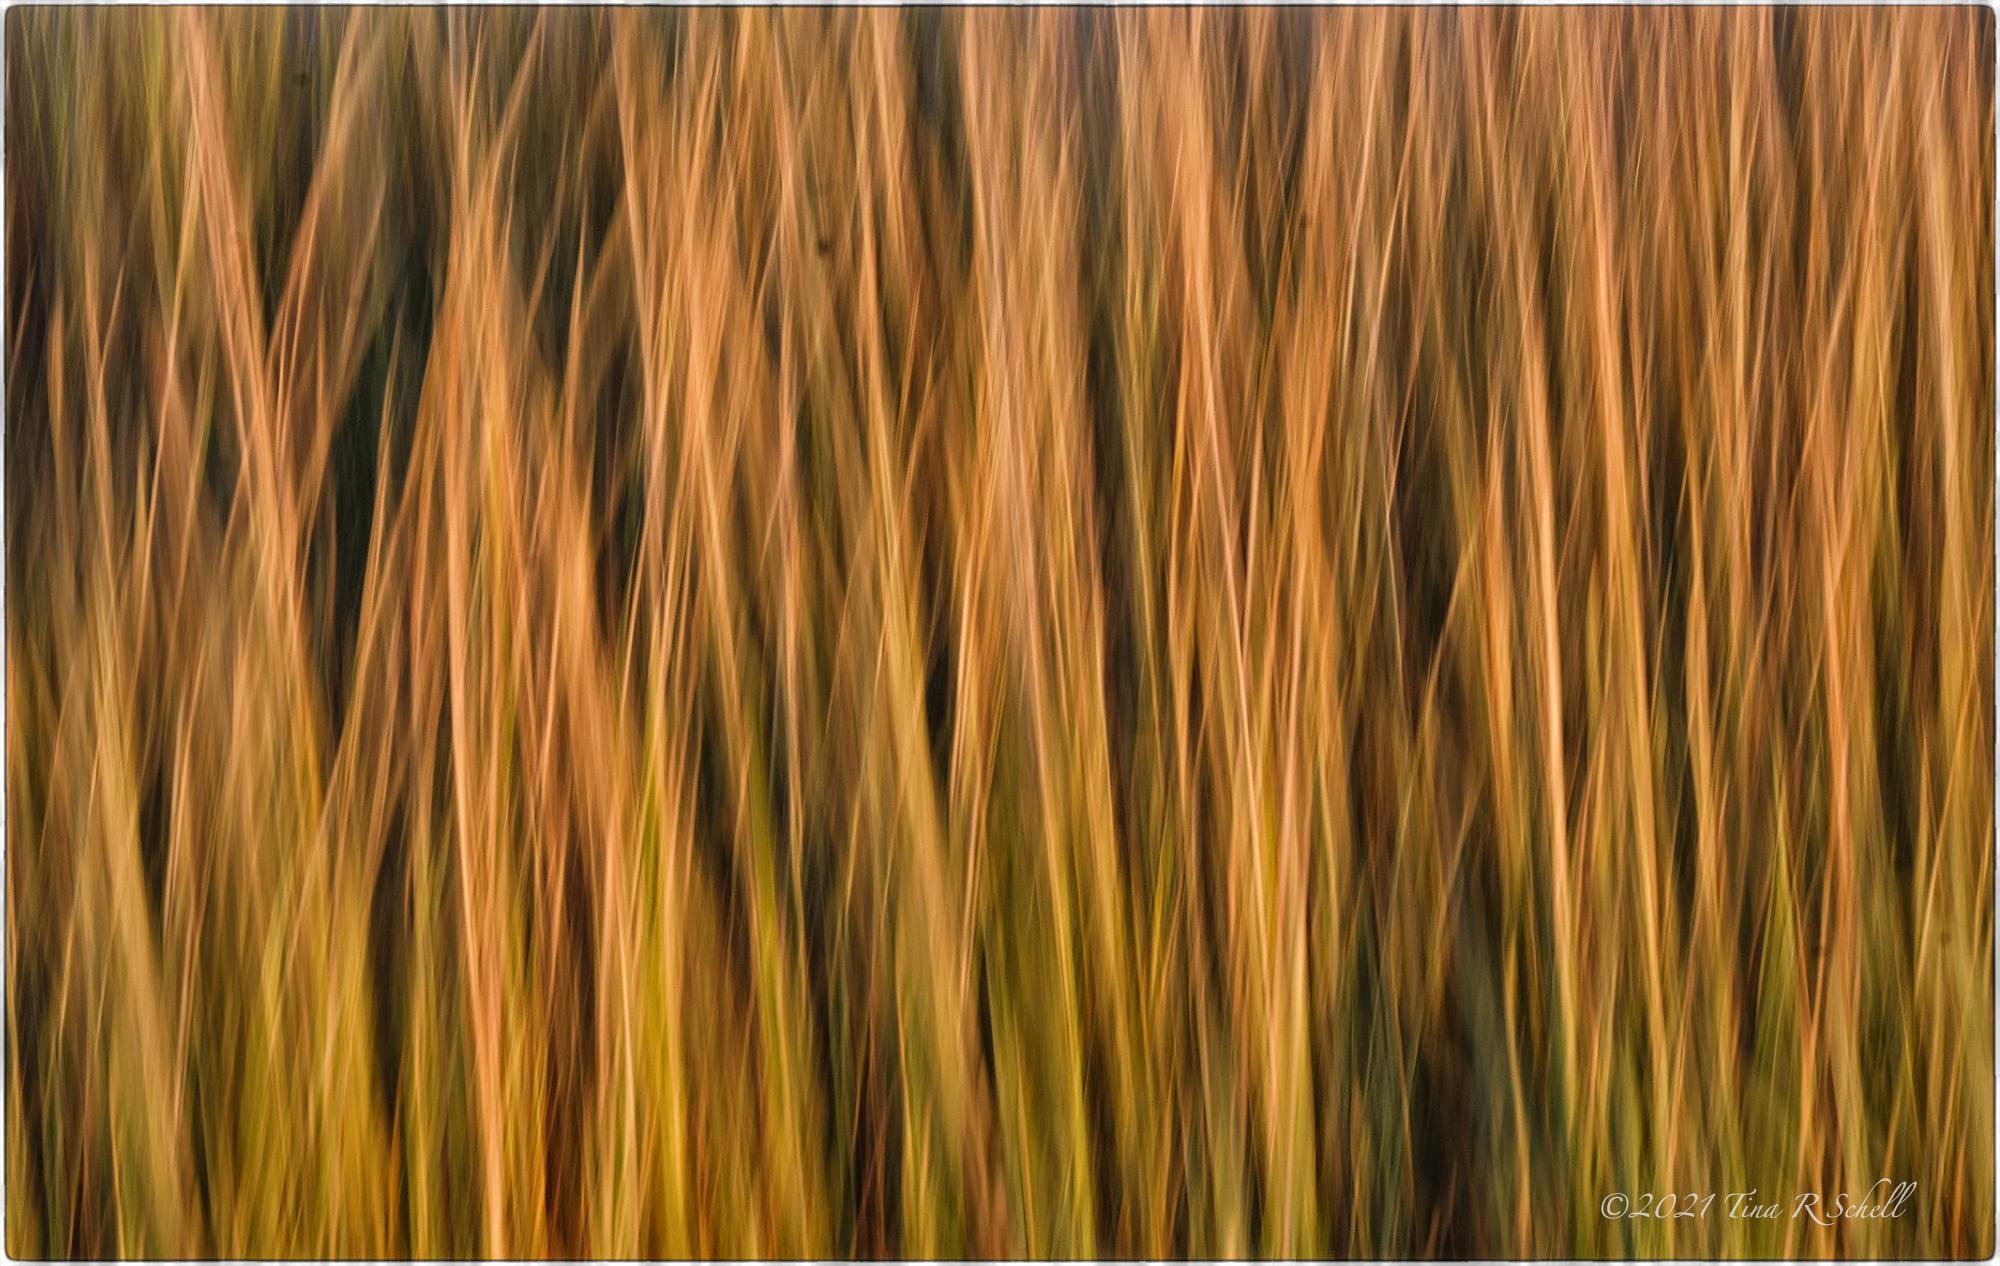 grasses, camera pan, golden